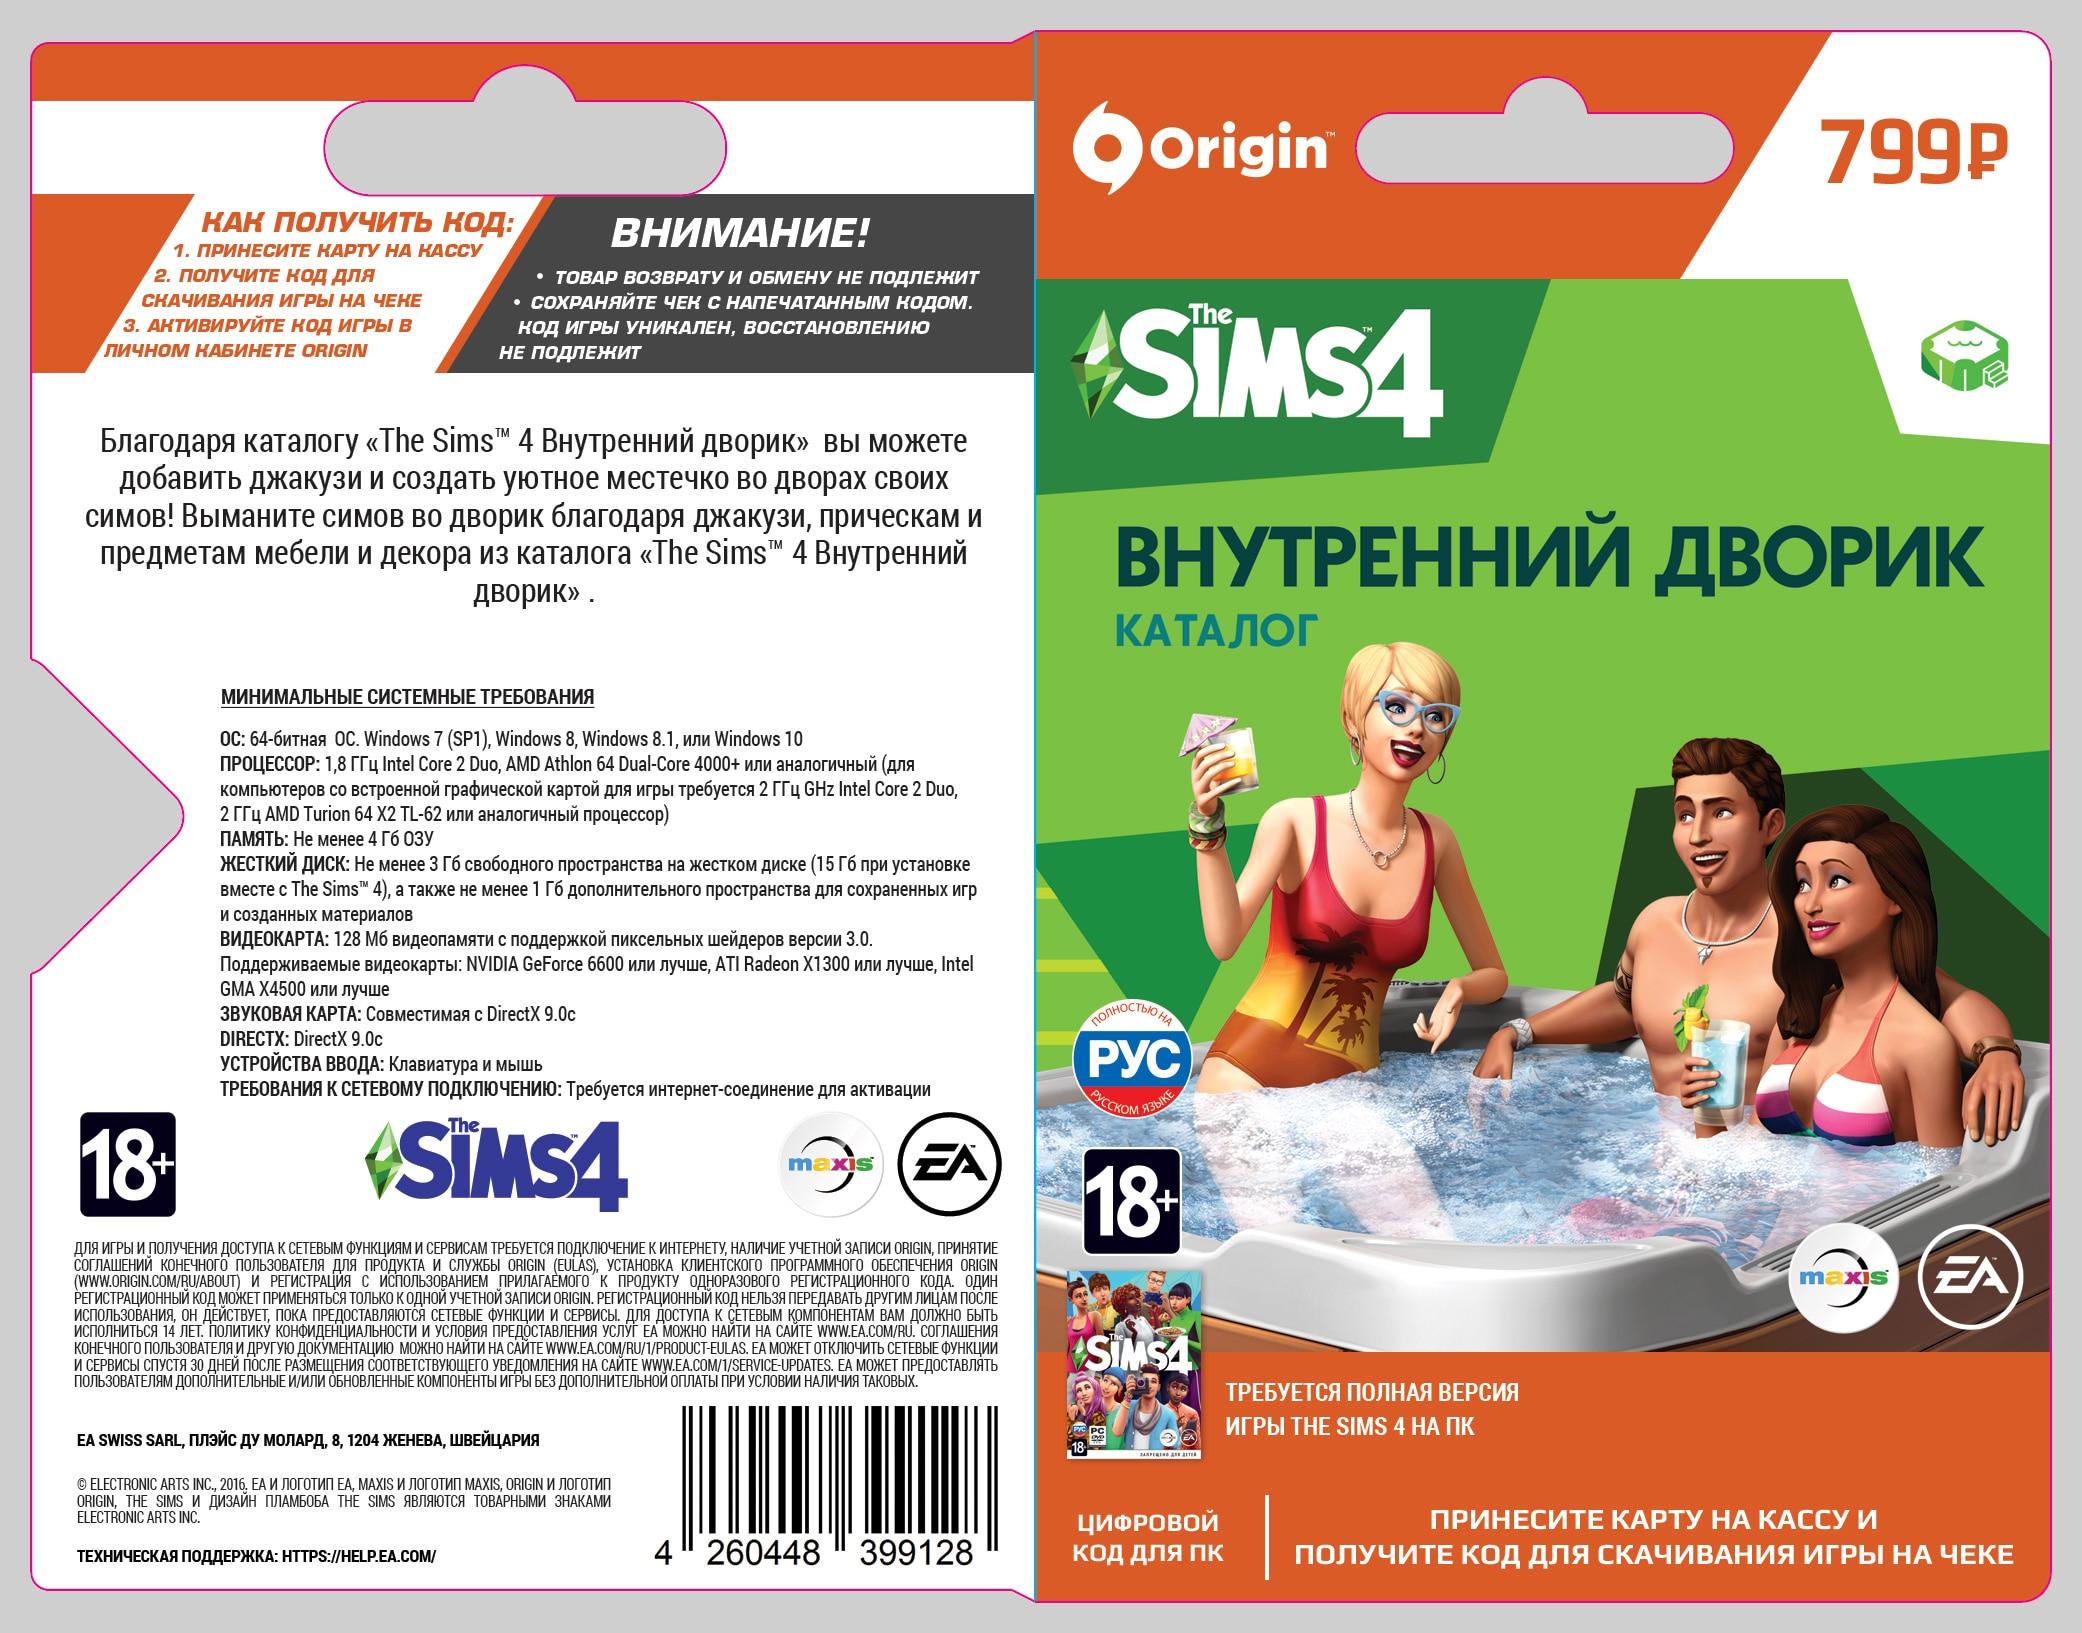 The Sims 4 Perfect Patio Stuff PC digital code